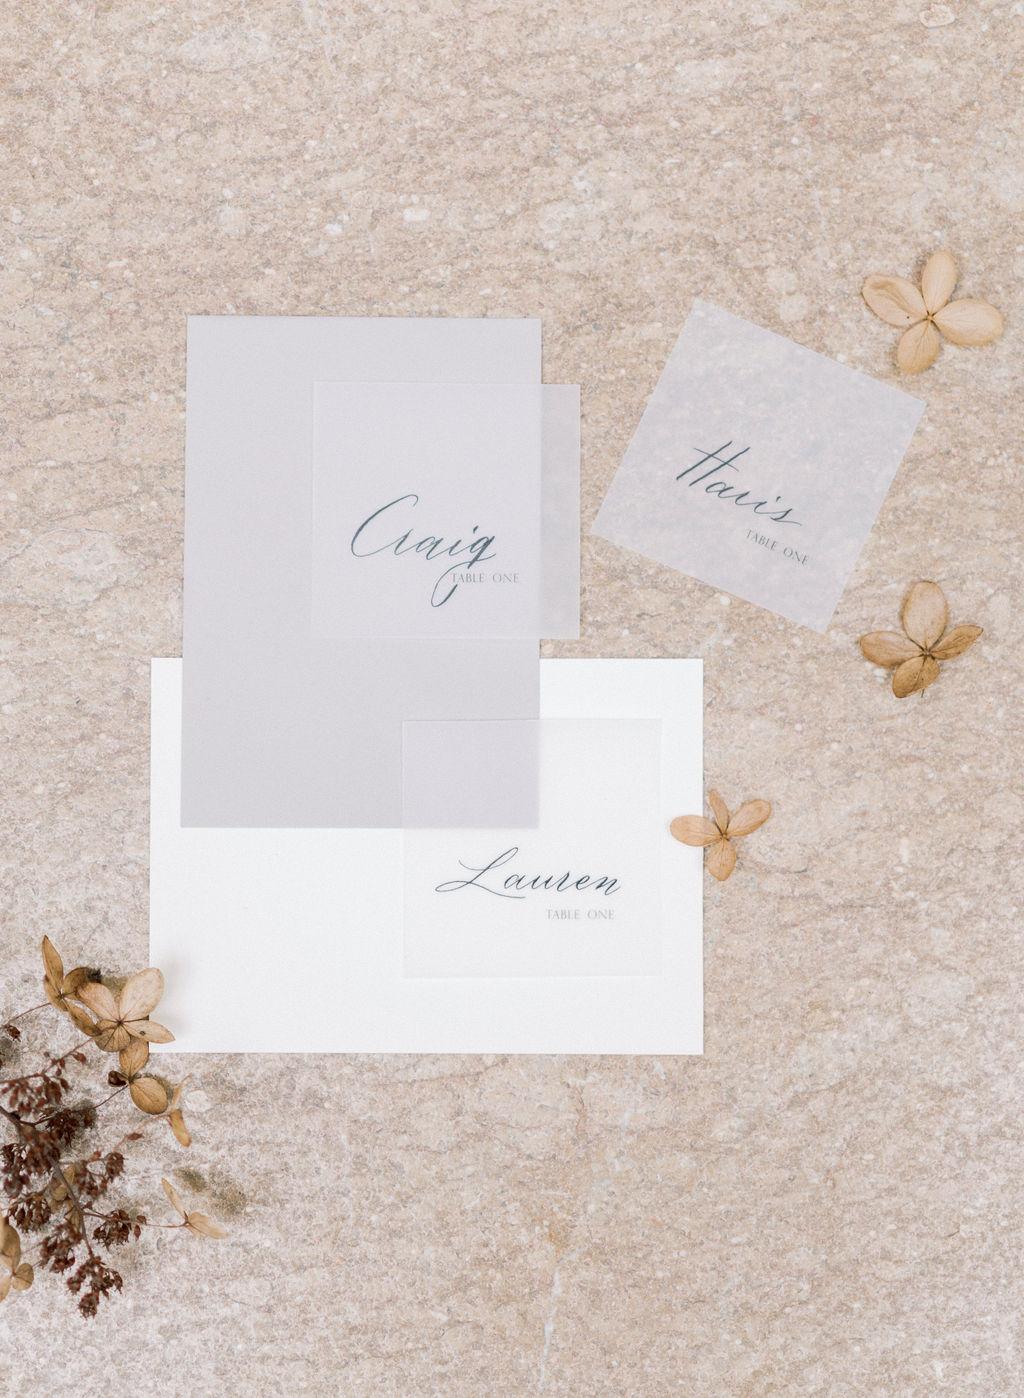 artiese-ago-wedding-editorial-06726.jpg